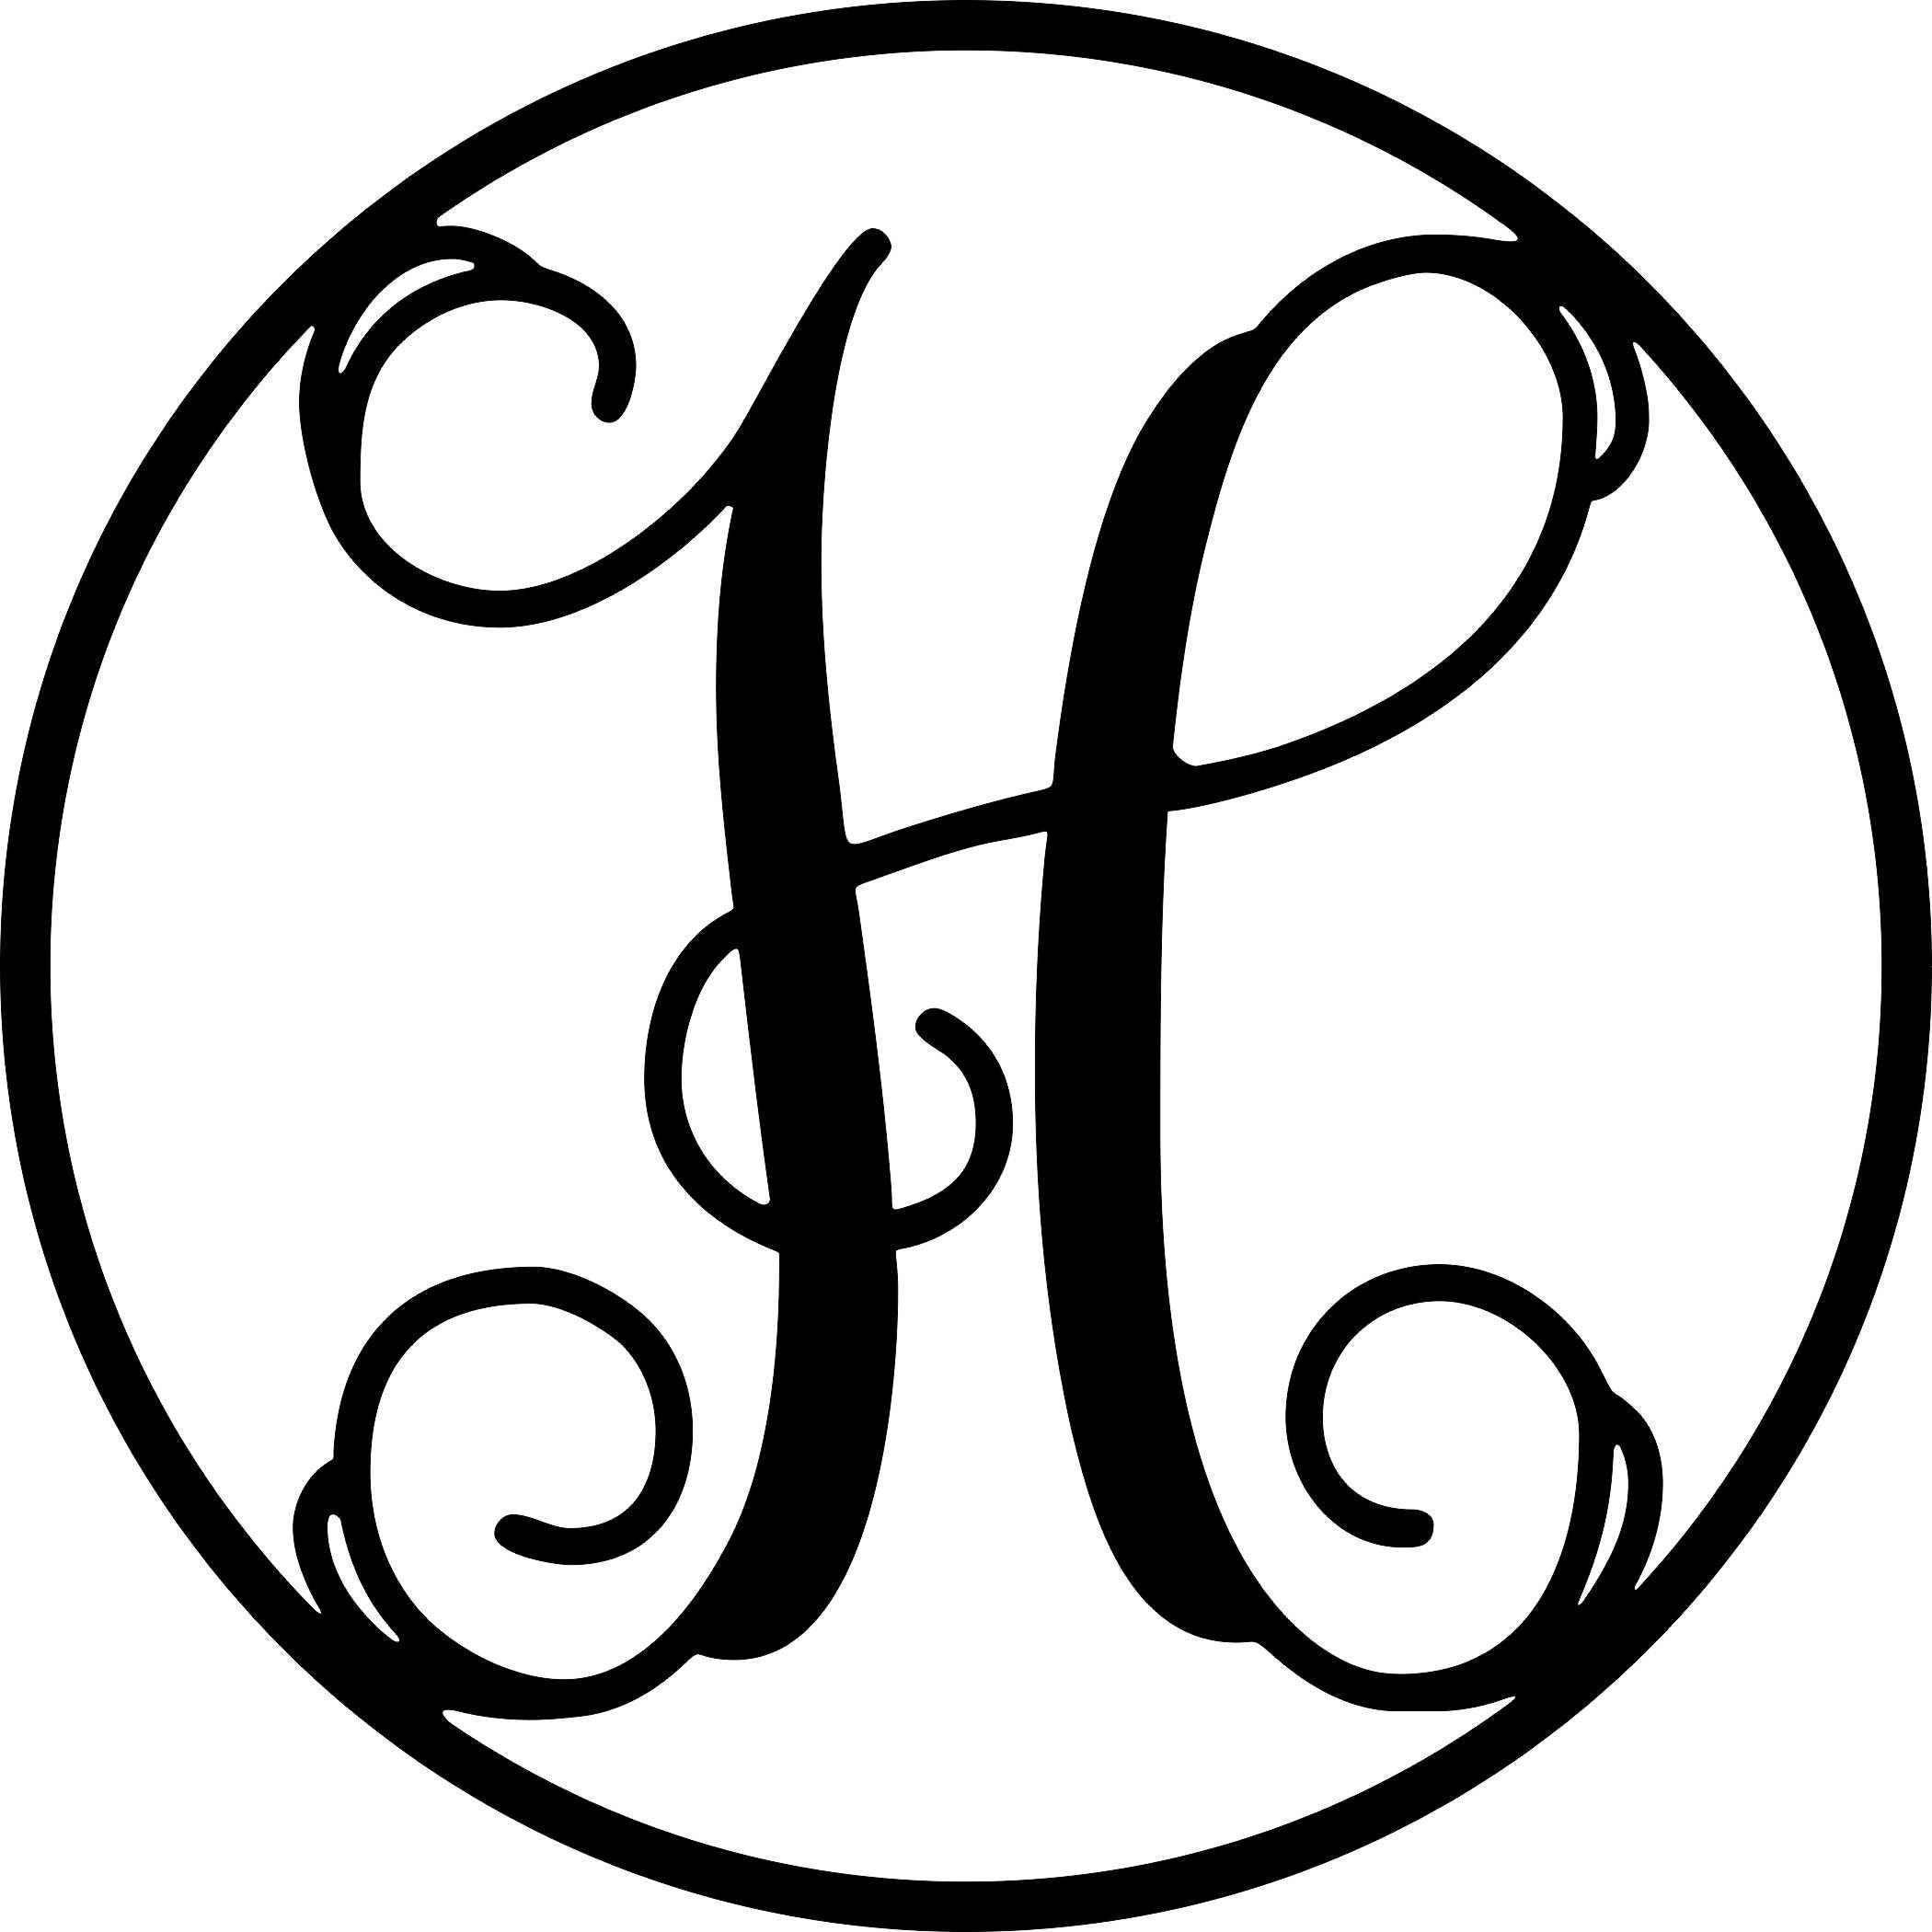 AJD Designs 22CR H Monogram Letter Circle H